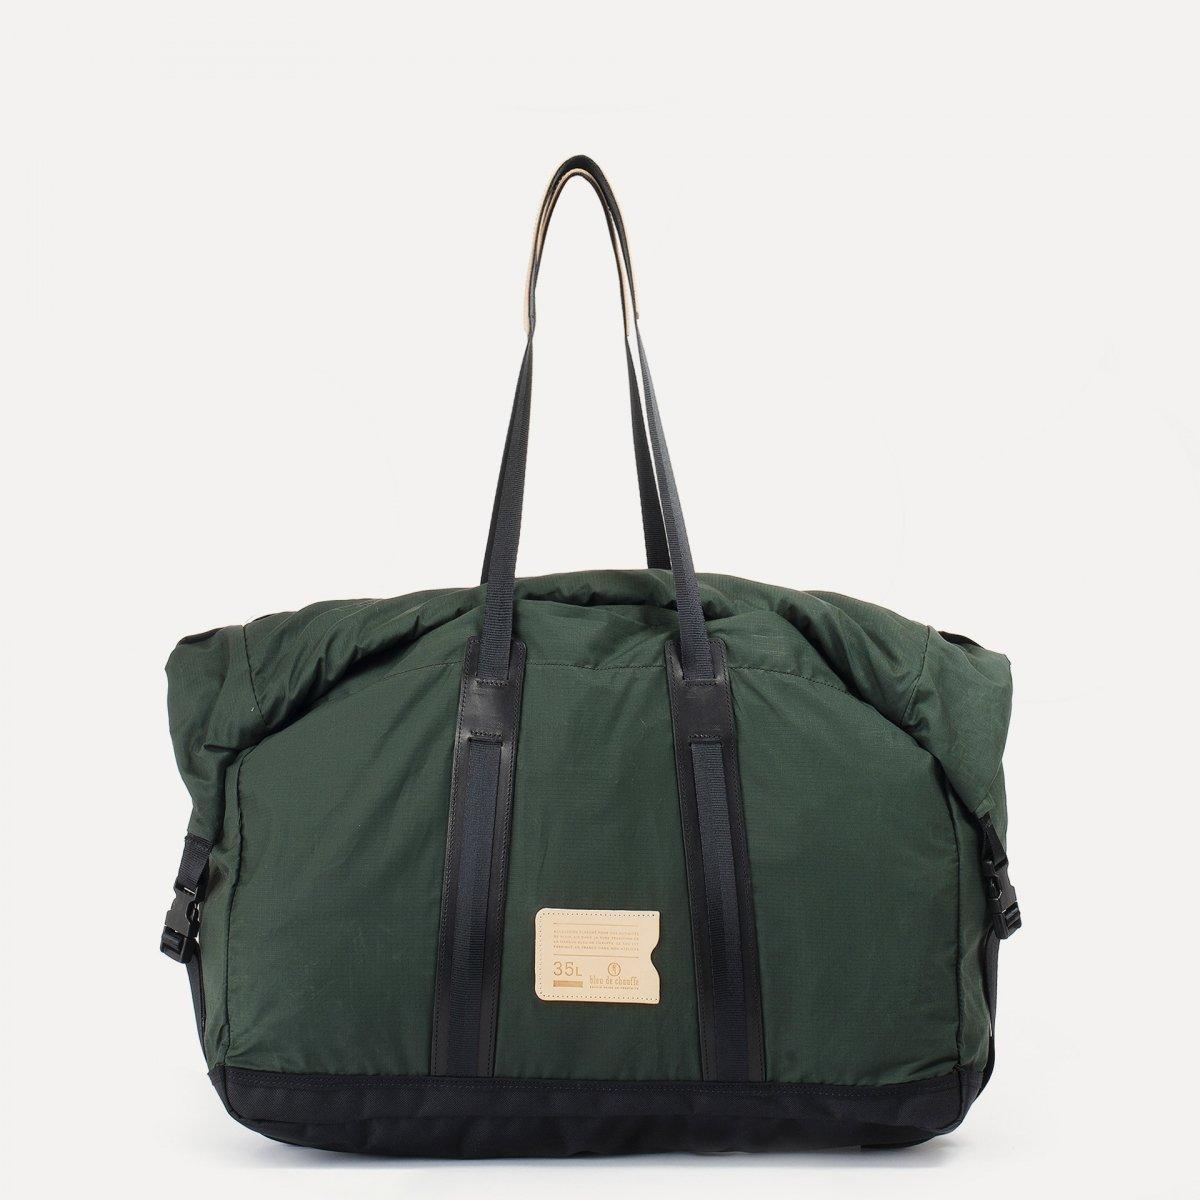 35L Baroud Travel bag - Dark Khaki (image n°1)